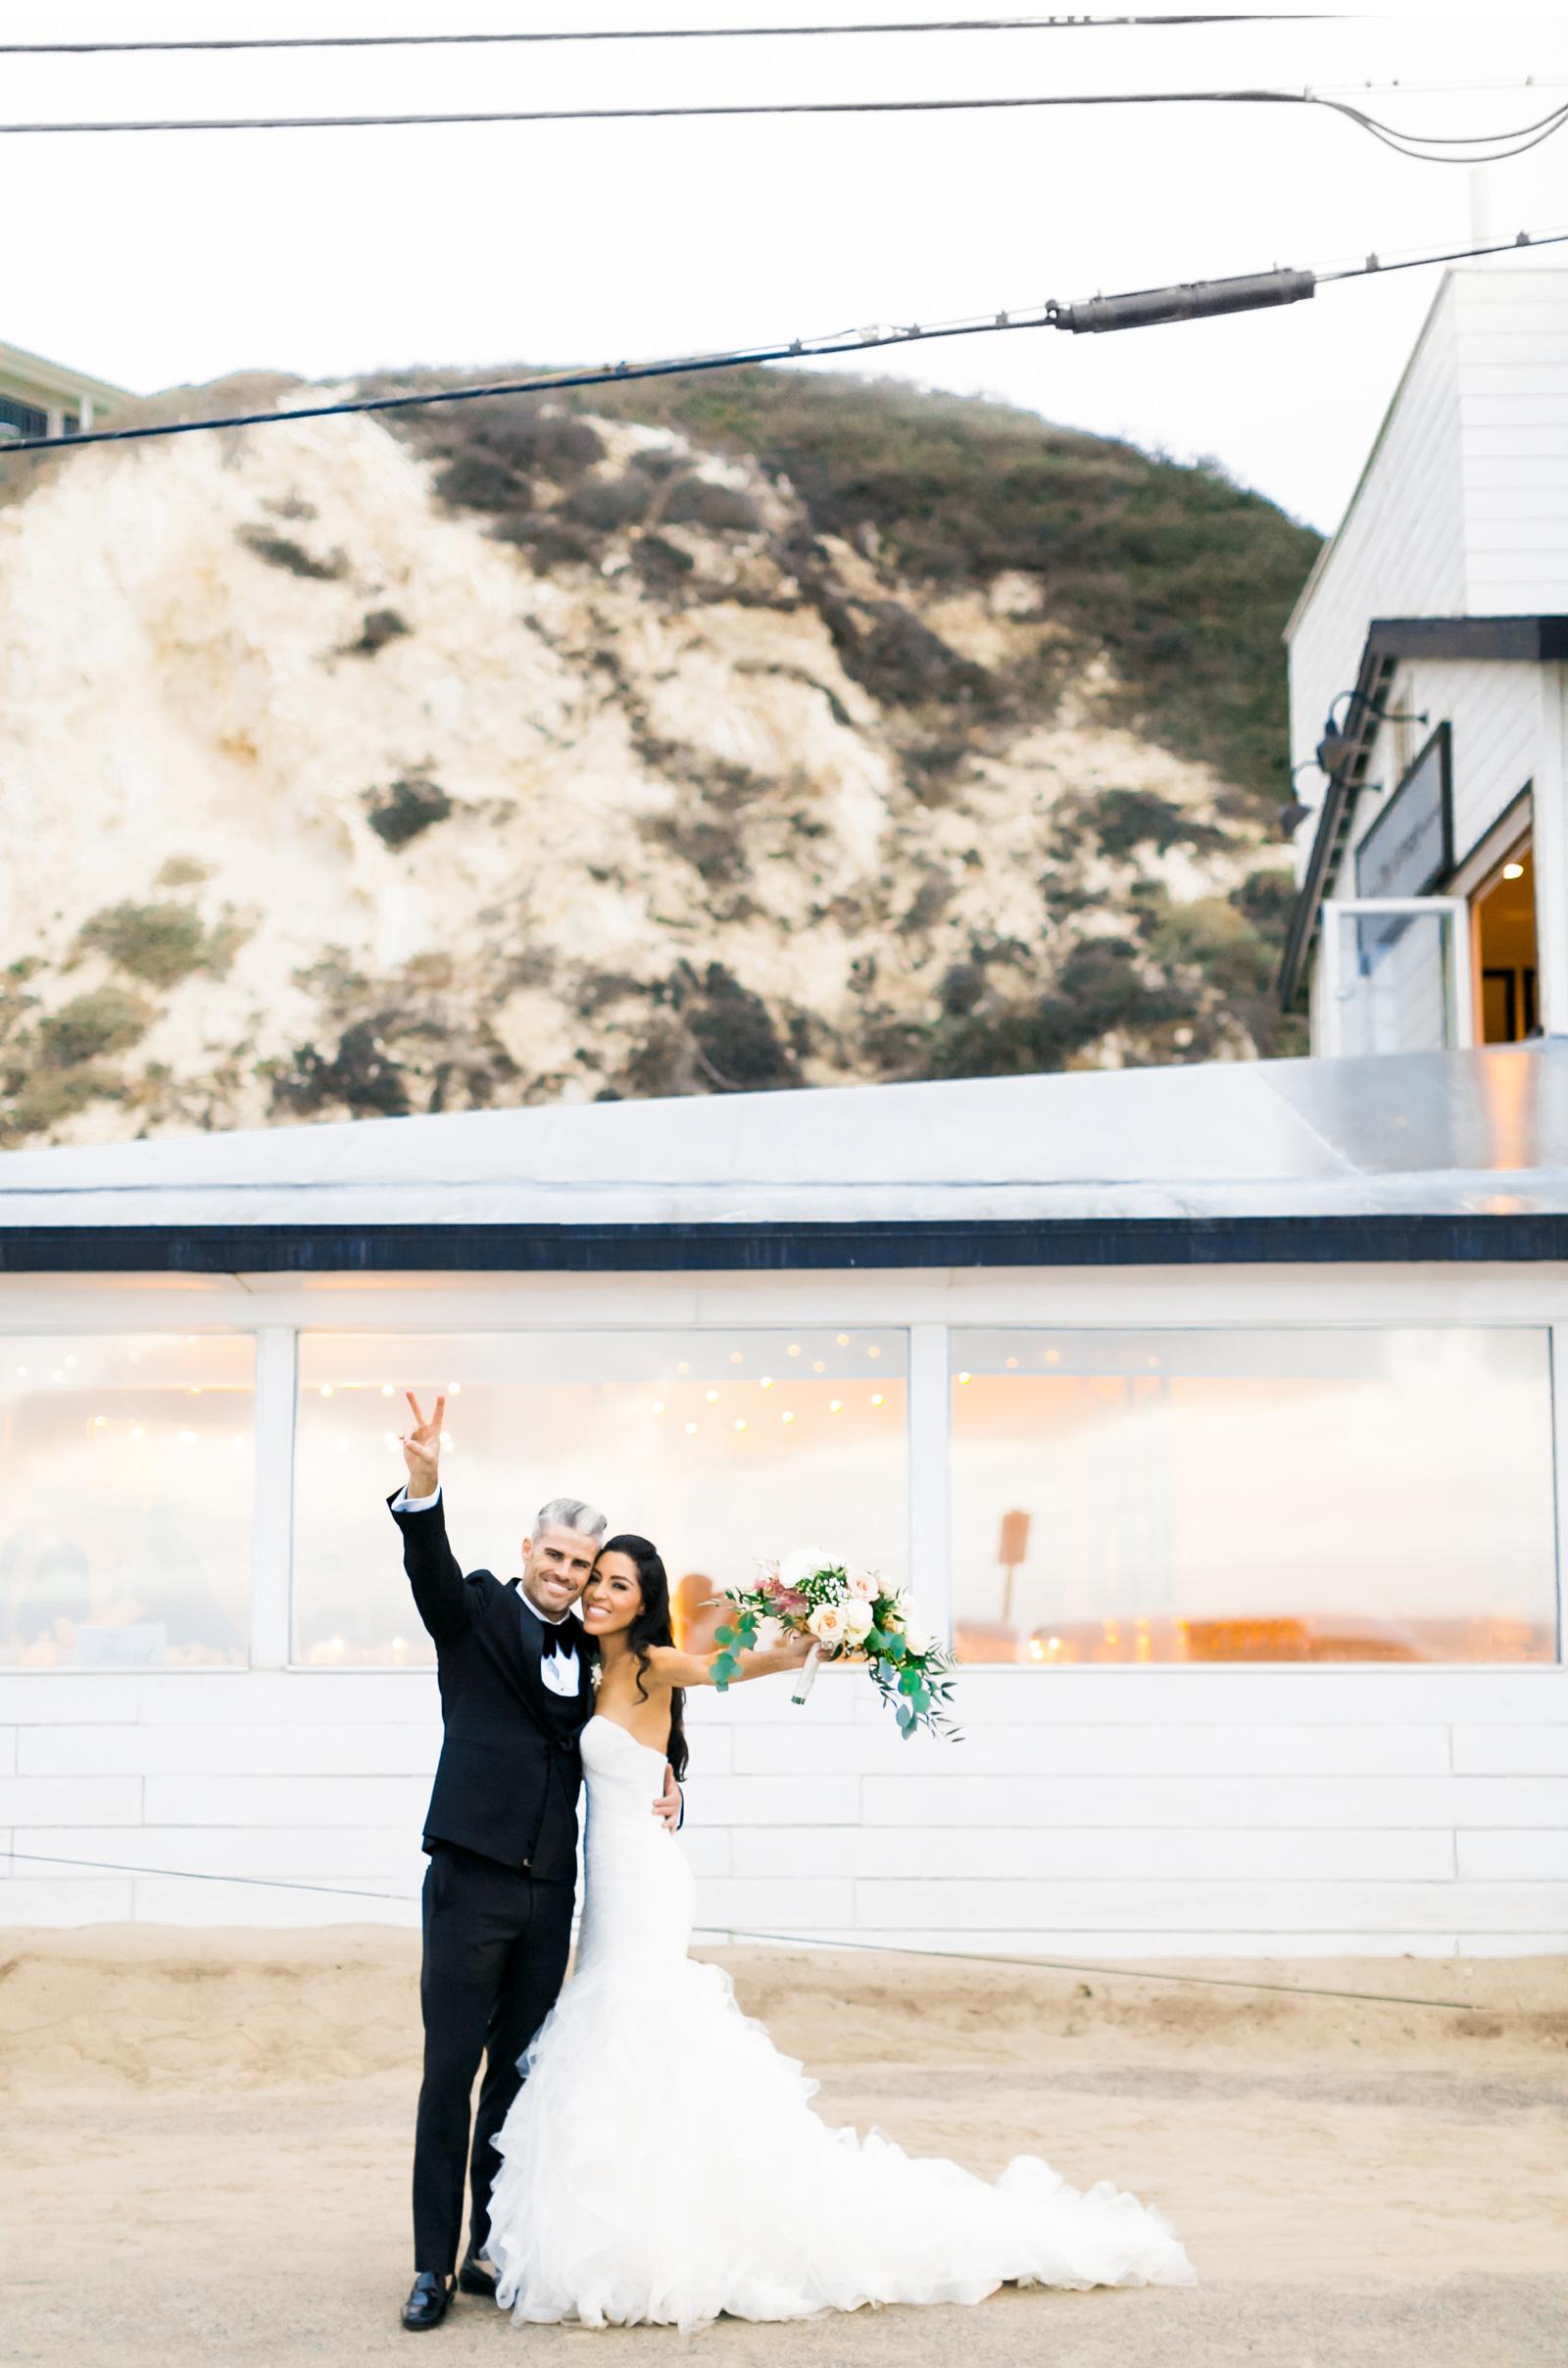 Style-Me-Pretty-Malibu-Beach-CA-Wedding-Natalie-Schutt-Photography_10.jpg